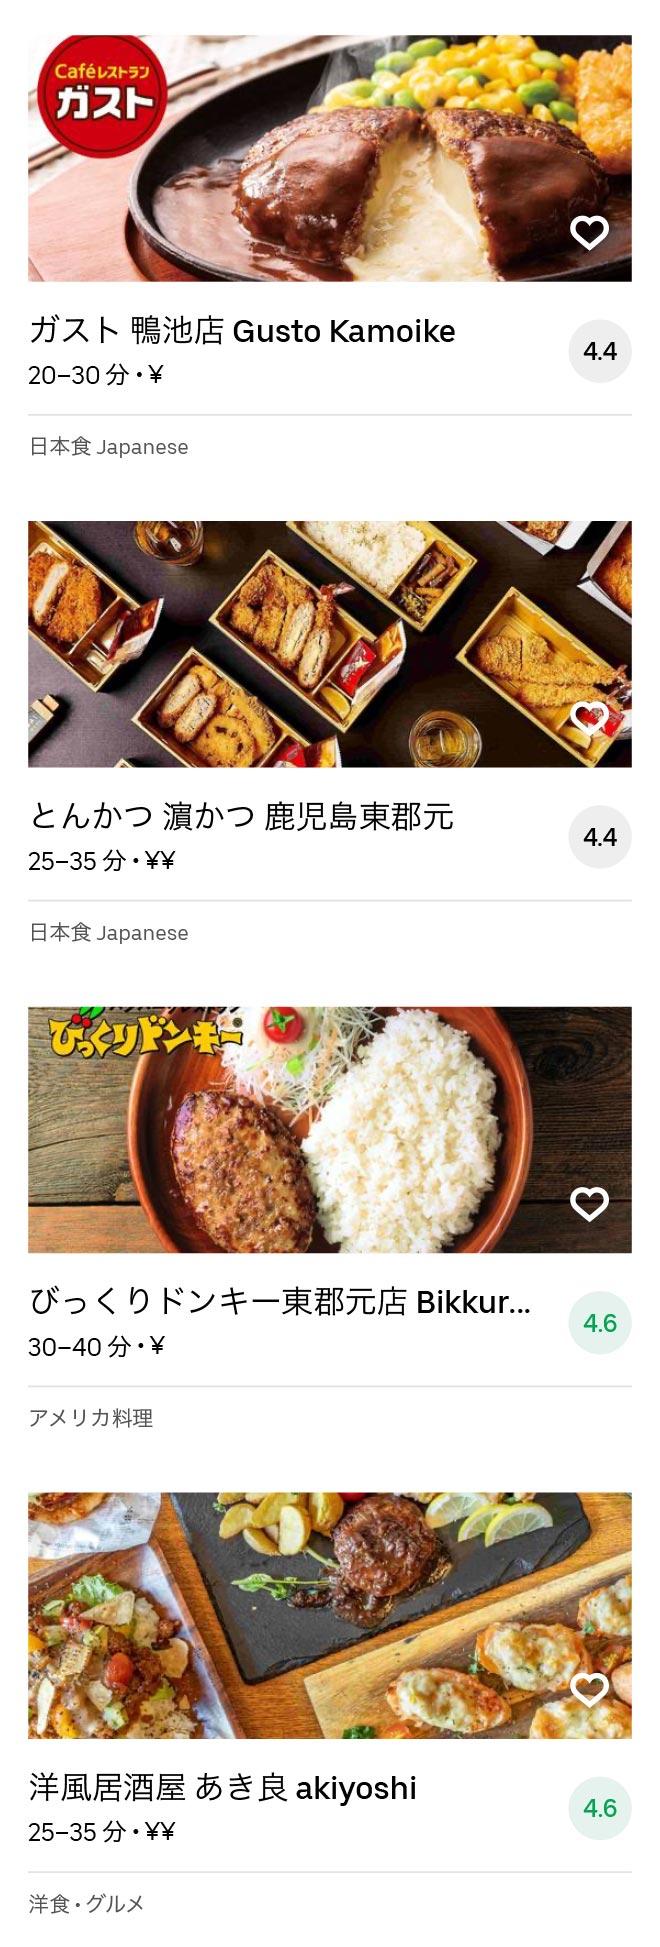 Korimoto menu 2009 4